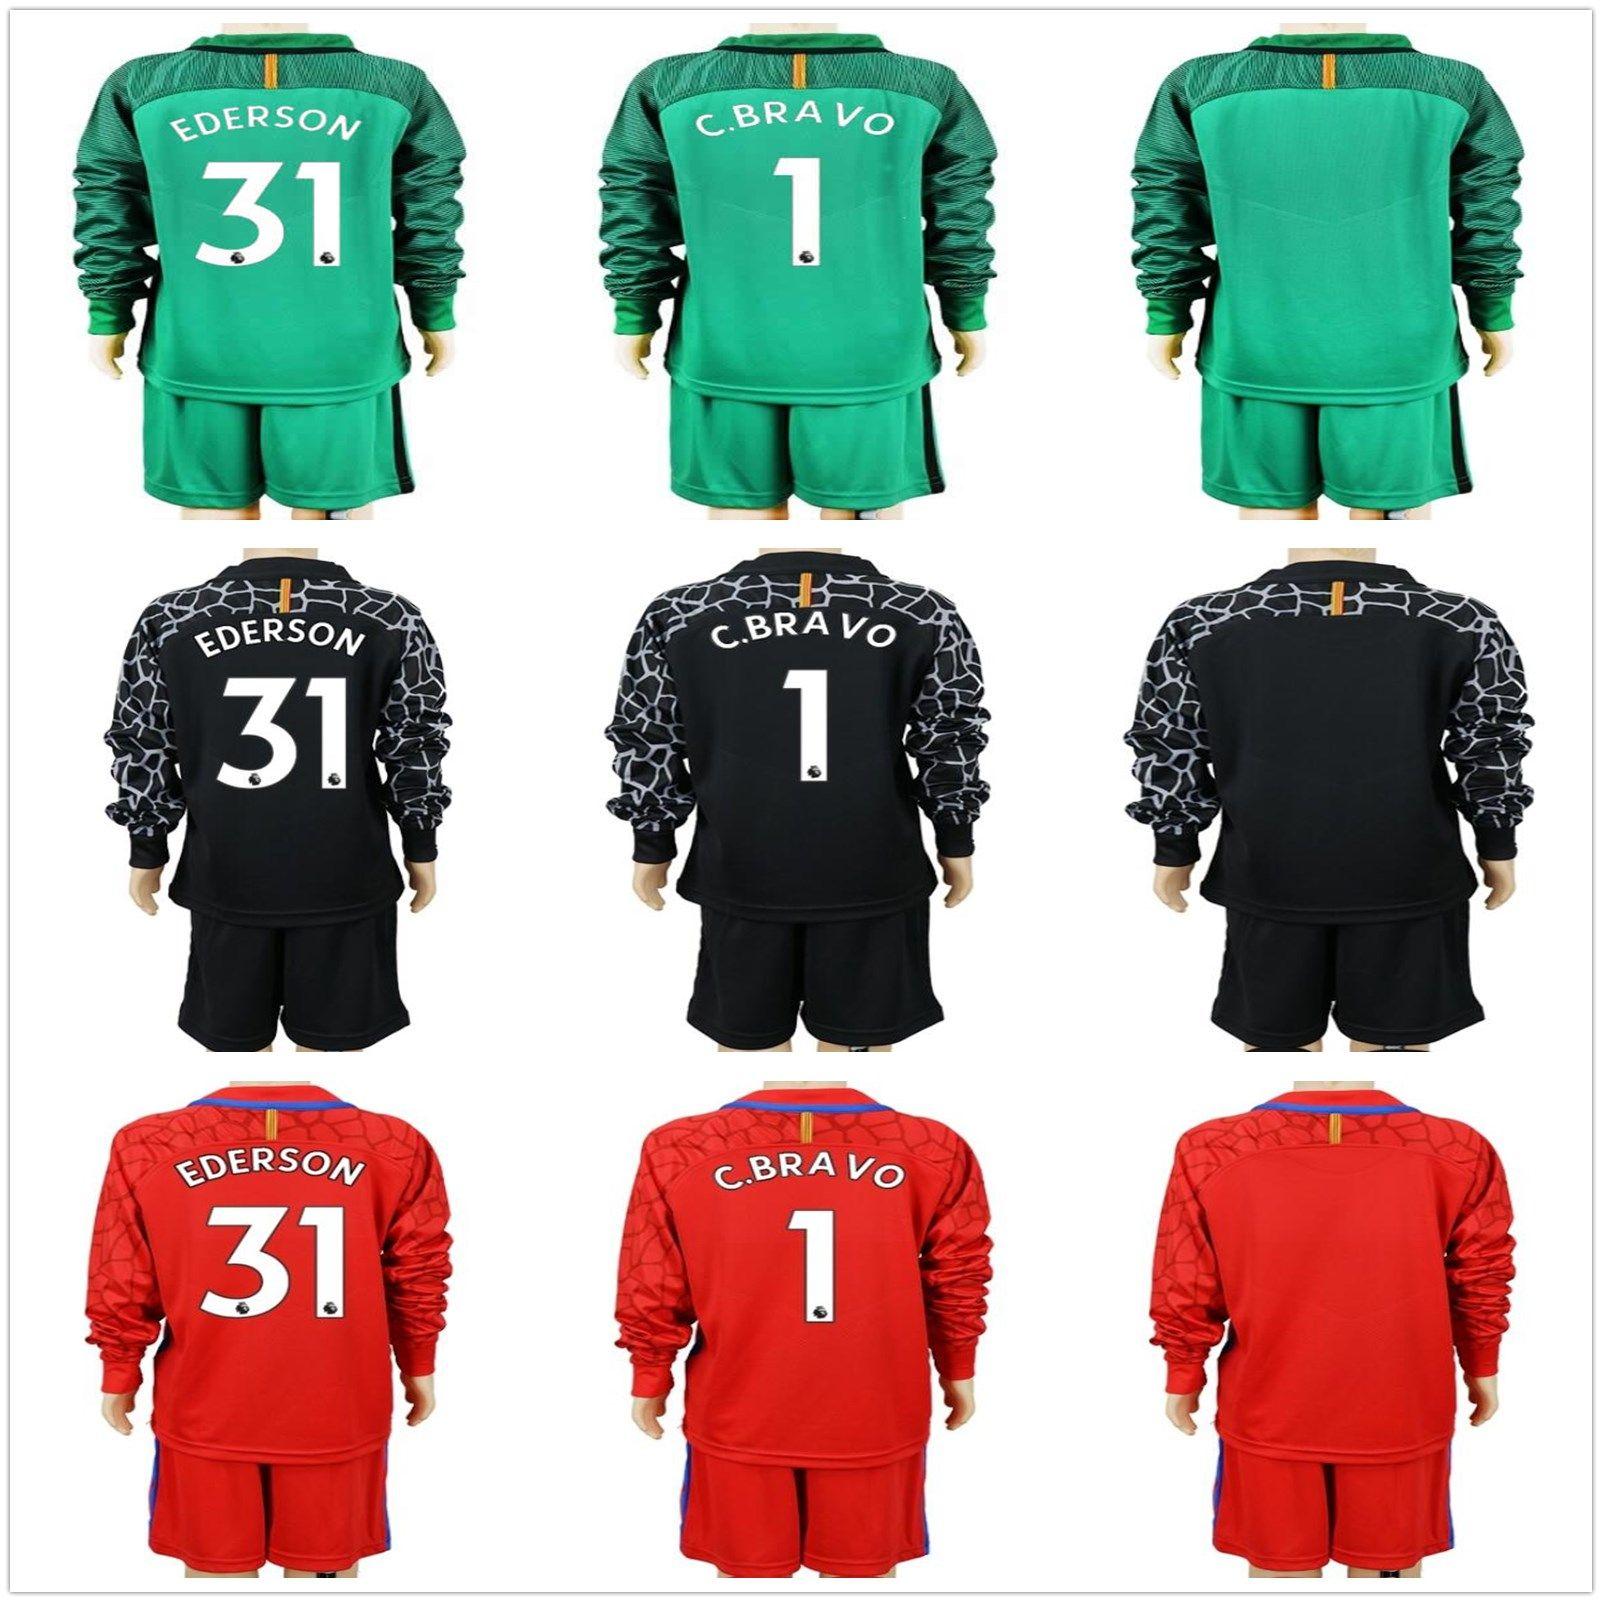 2017 2018 long kids city goalkeeper jerseys youth claudio bravo goalkeeper jersey c. bravo ederson child goalkeeper soccer sets uniform kits camisetas